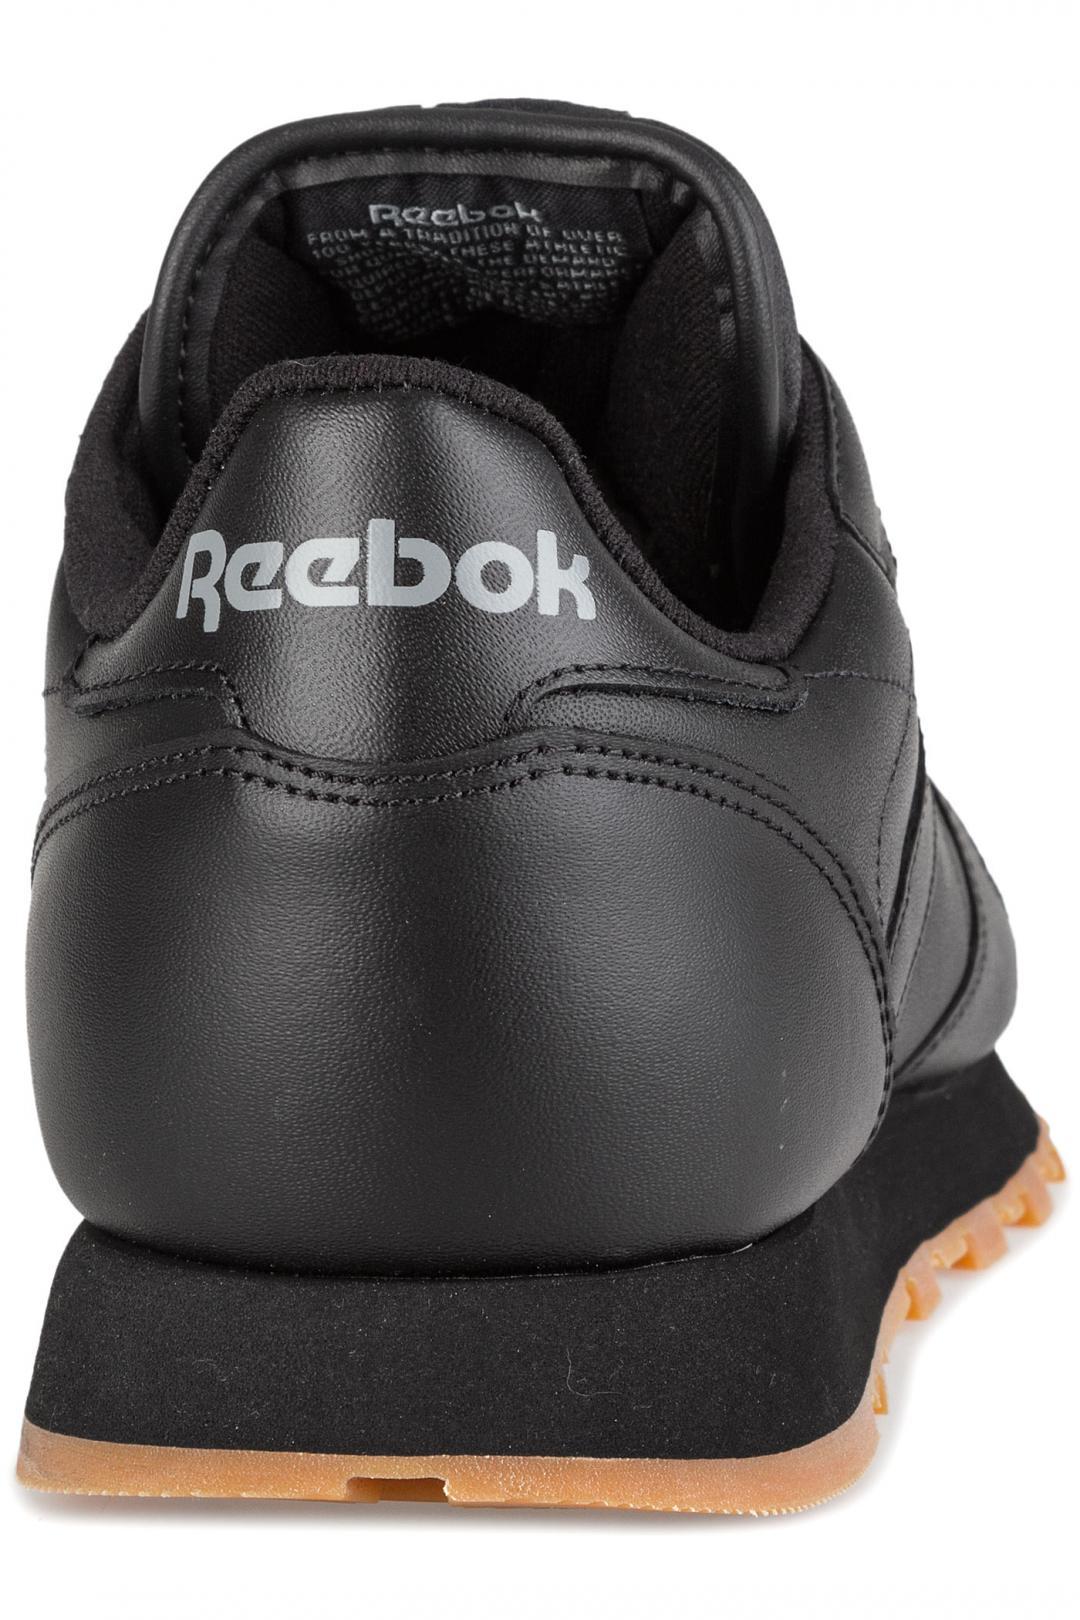 Uomo Reebok Classic Leather black gum   Sneaker